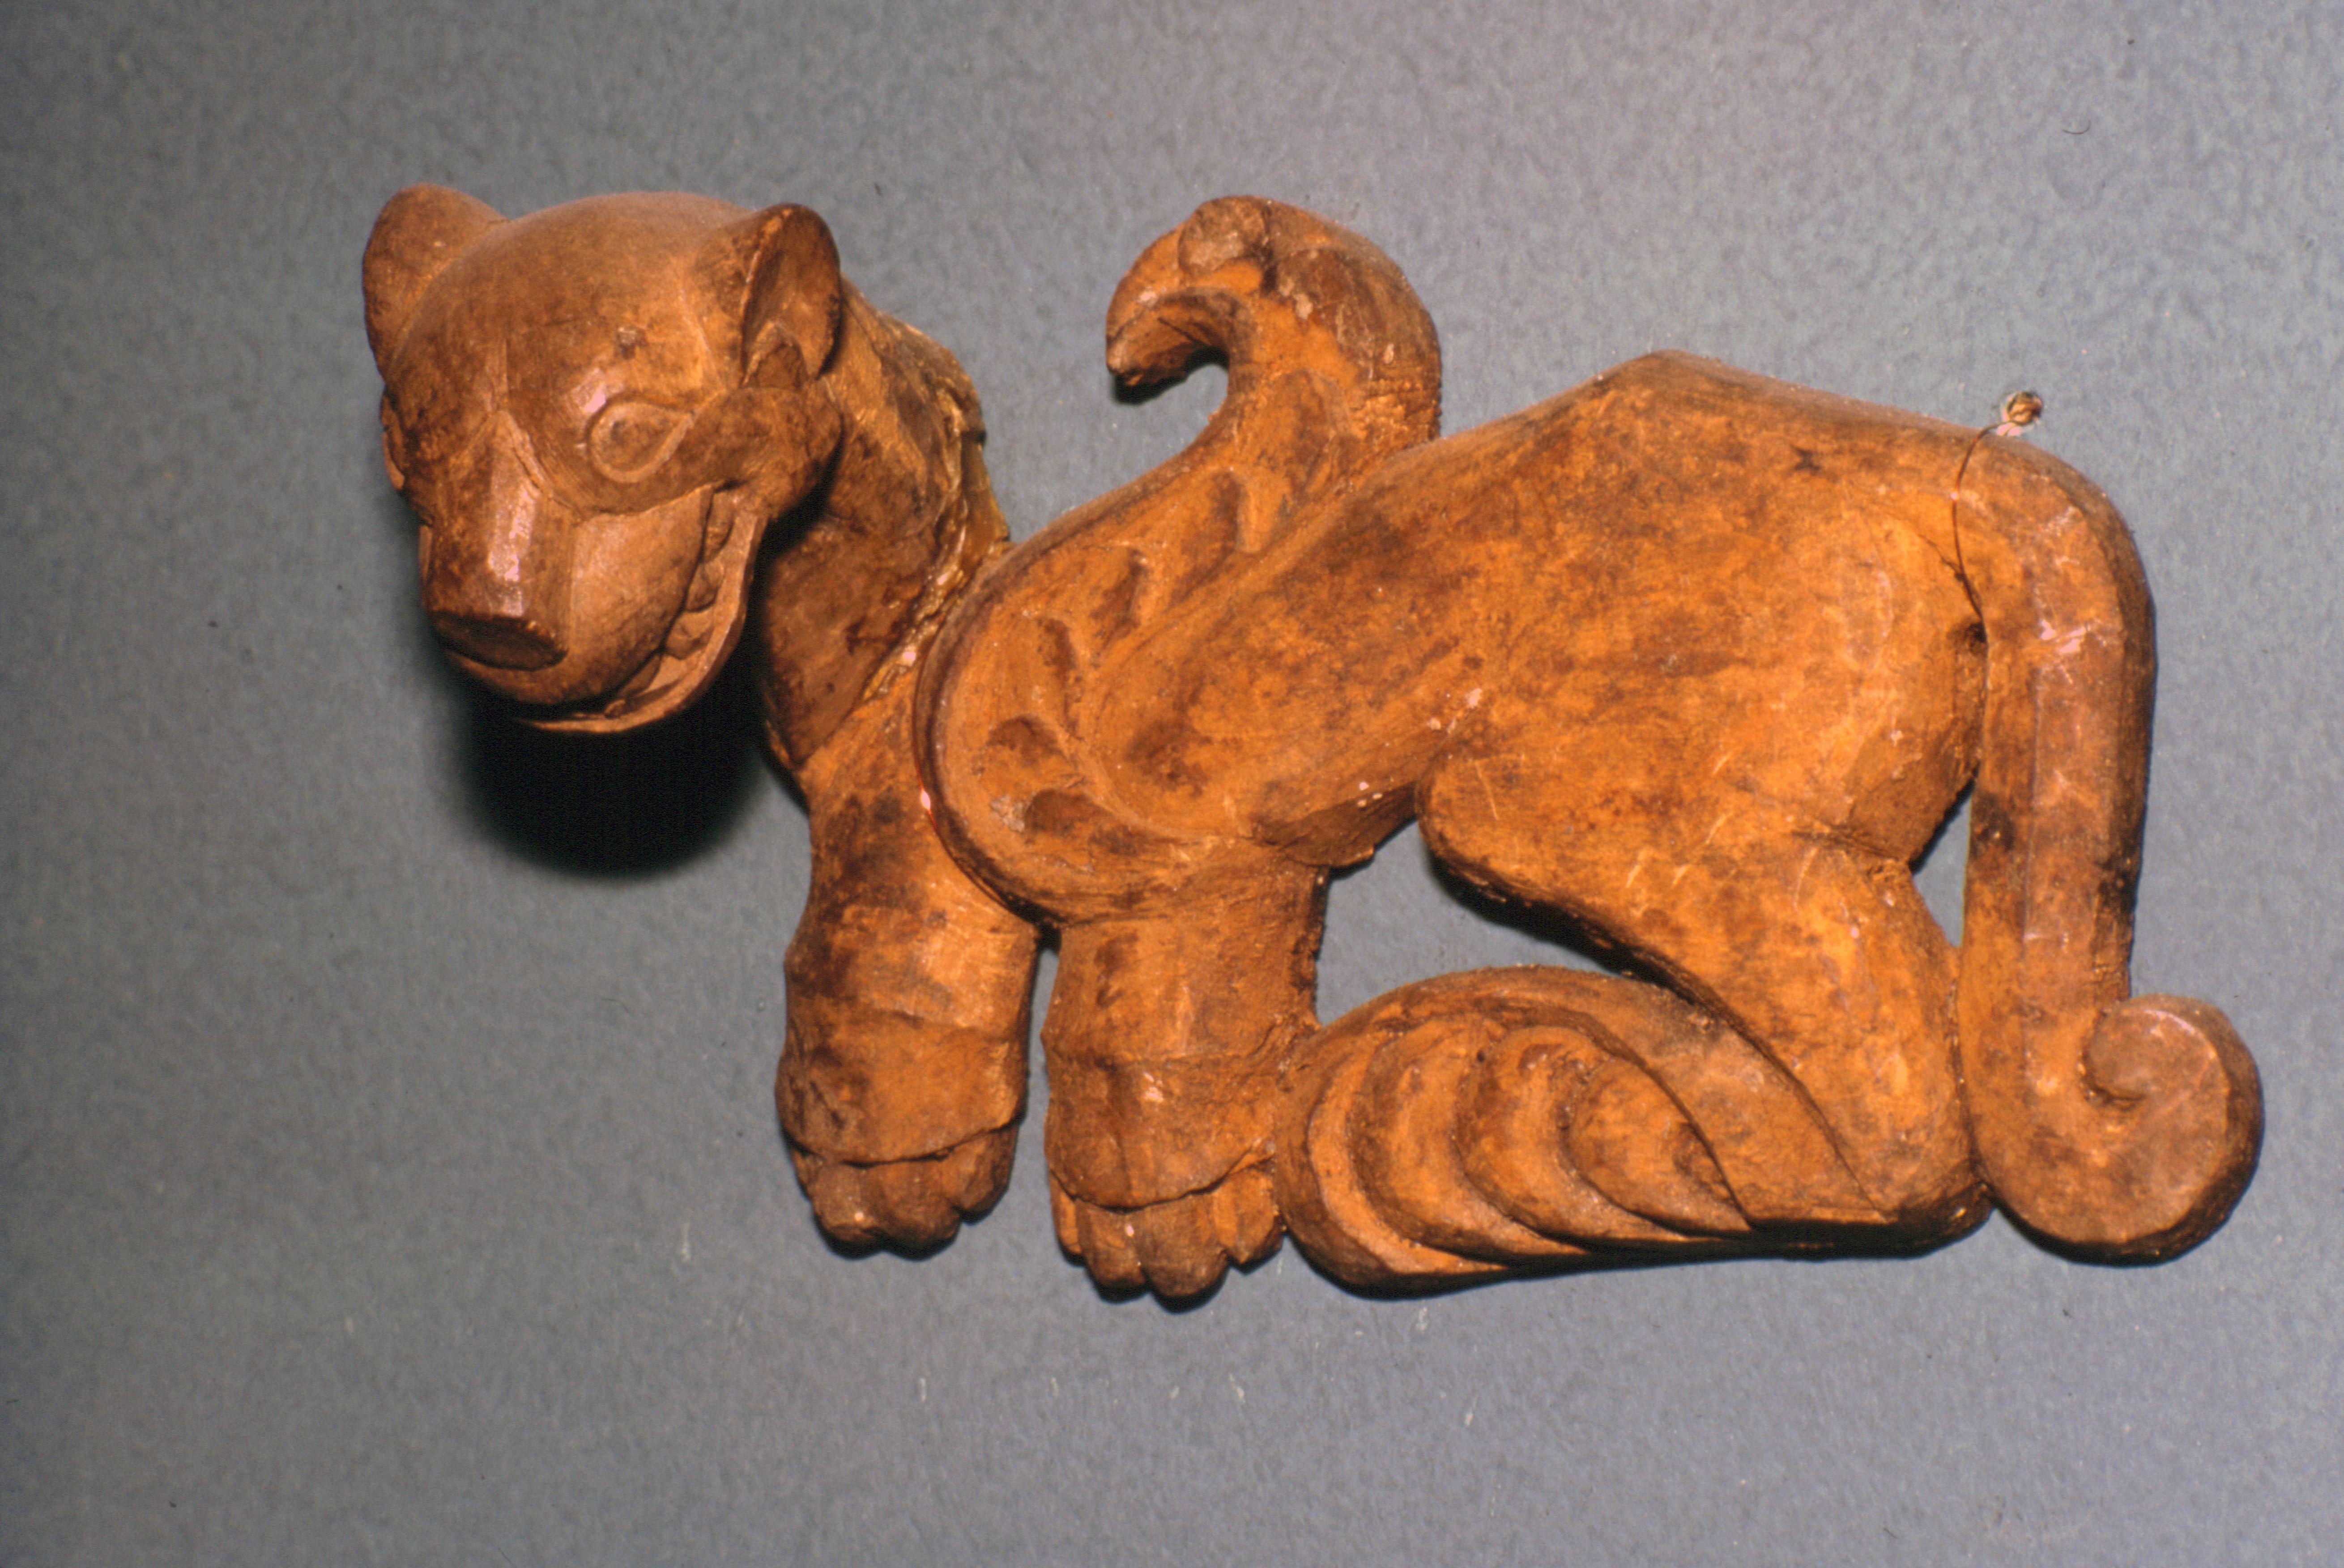 Scythian ξύλινο χαλινά στολίδι.  Καλλιτέχνης: Άγνωστος.